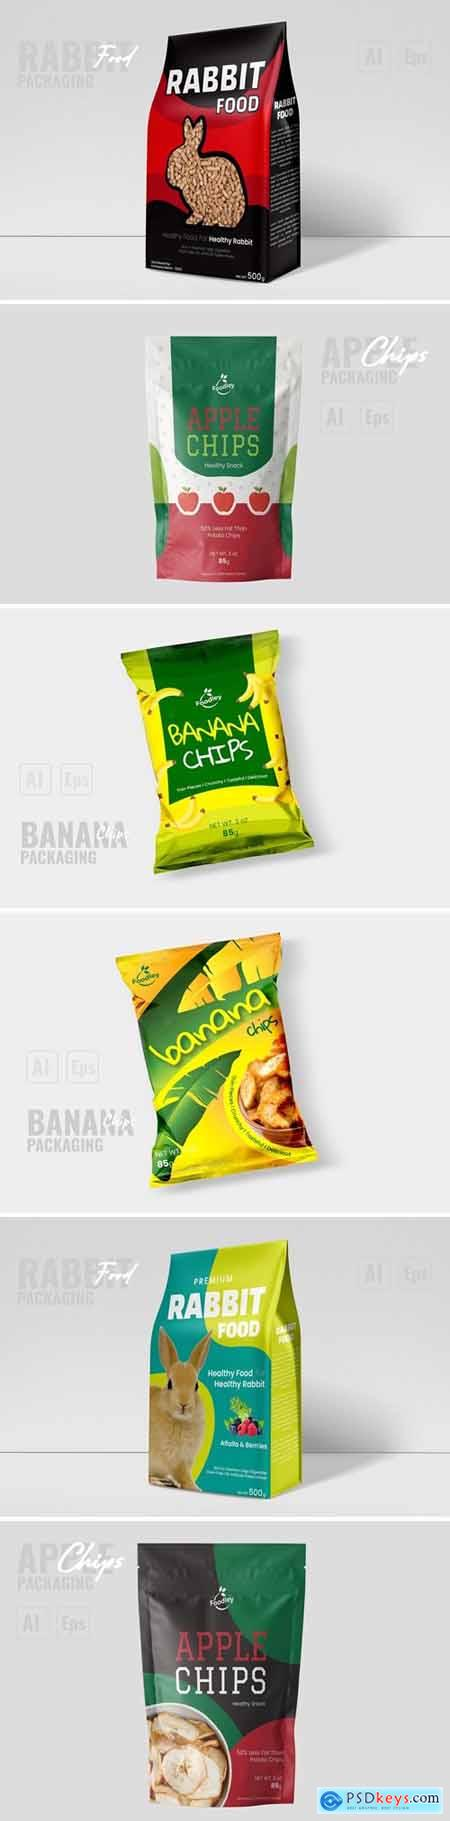 Modern Apple Chips Packaging